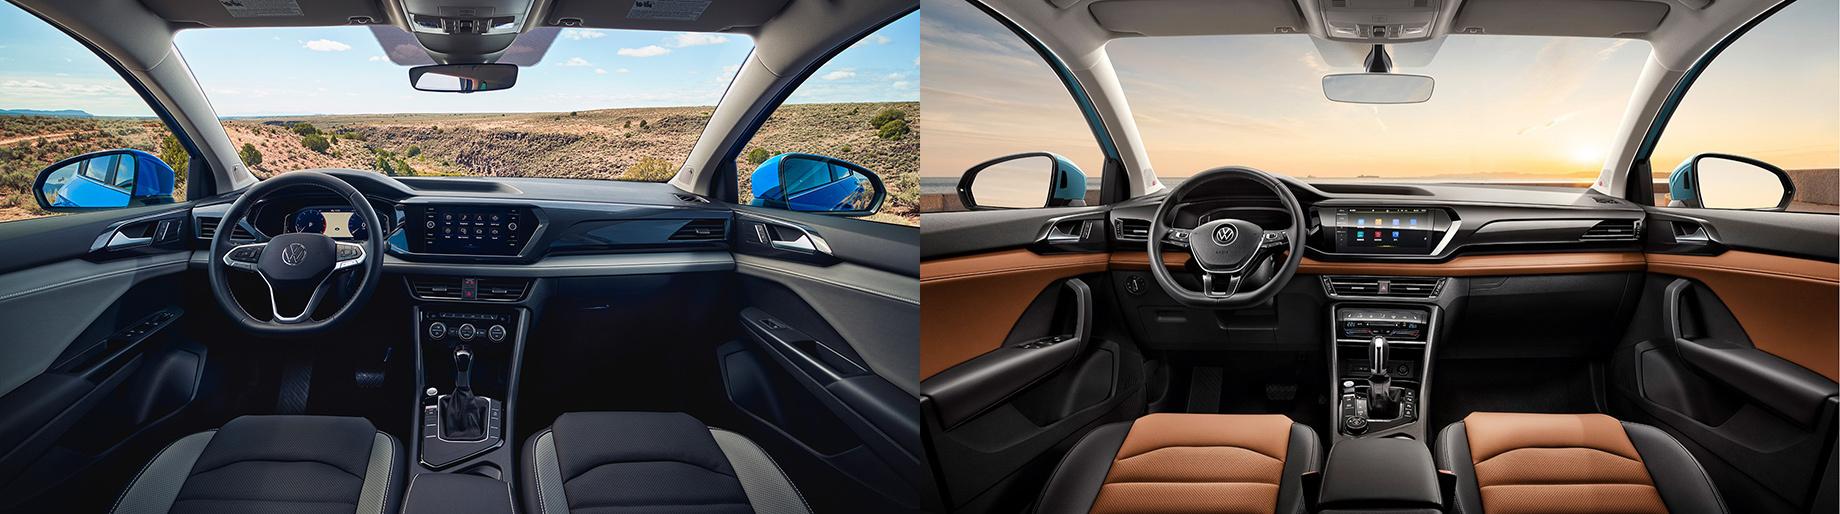 Volkswagen Taos начнёт покорять Америку летом